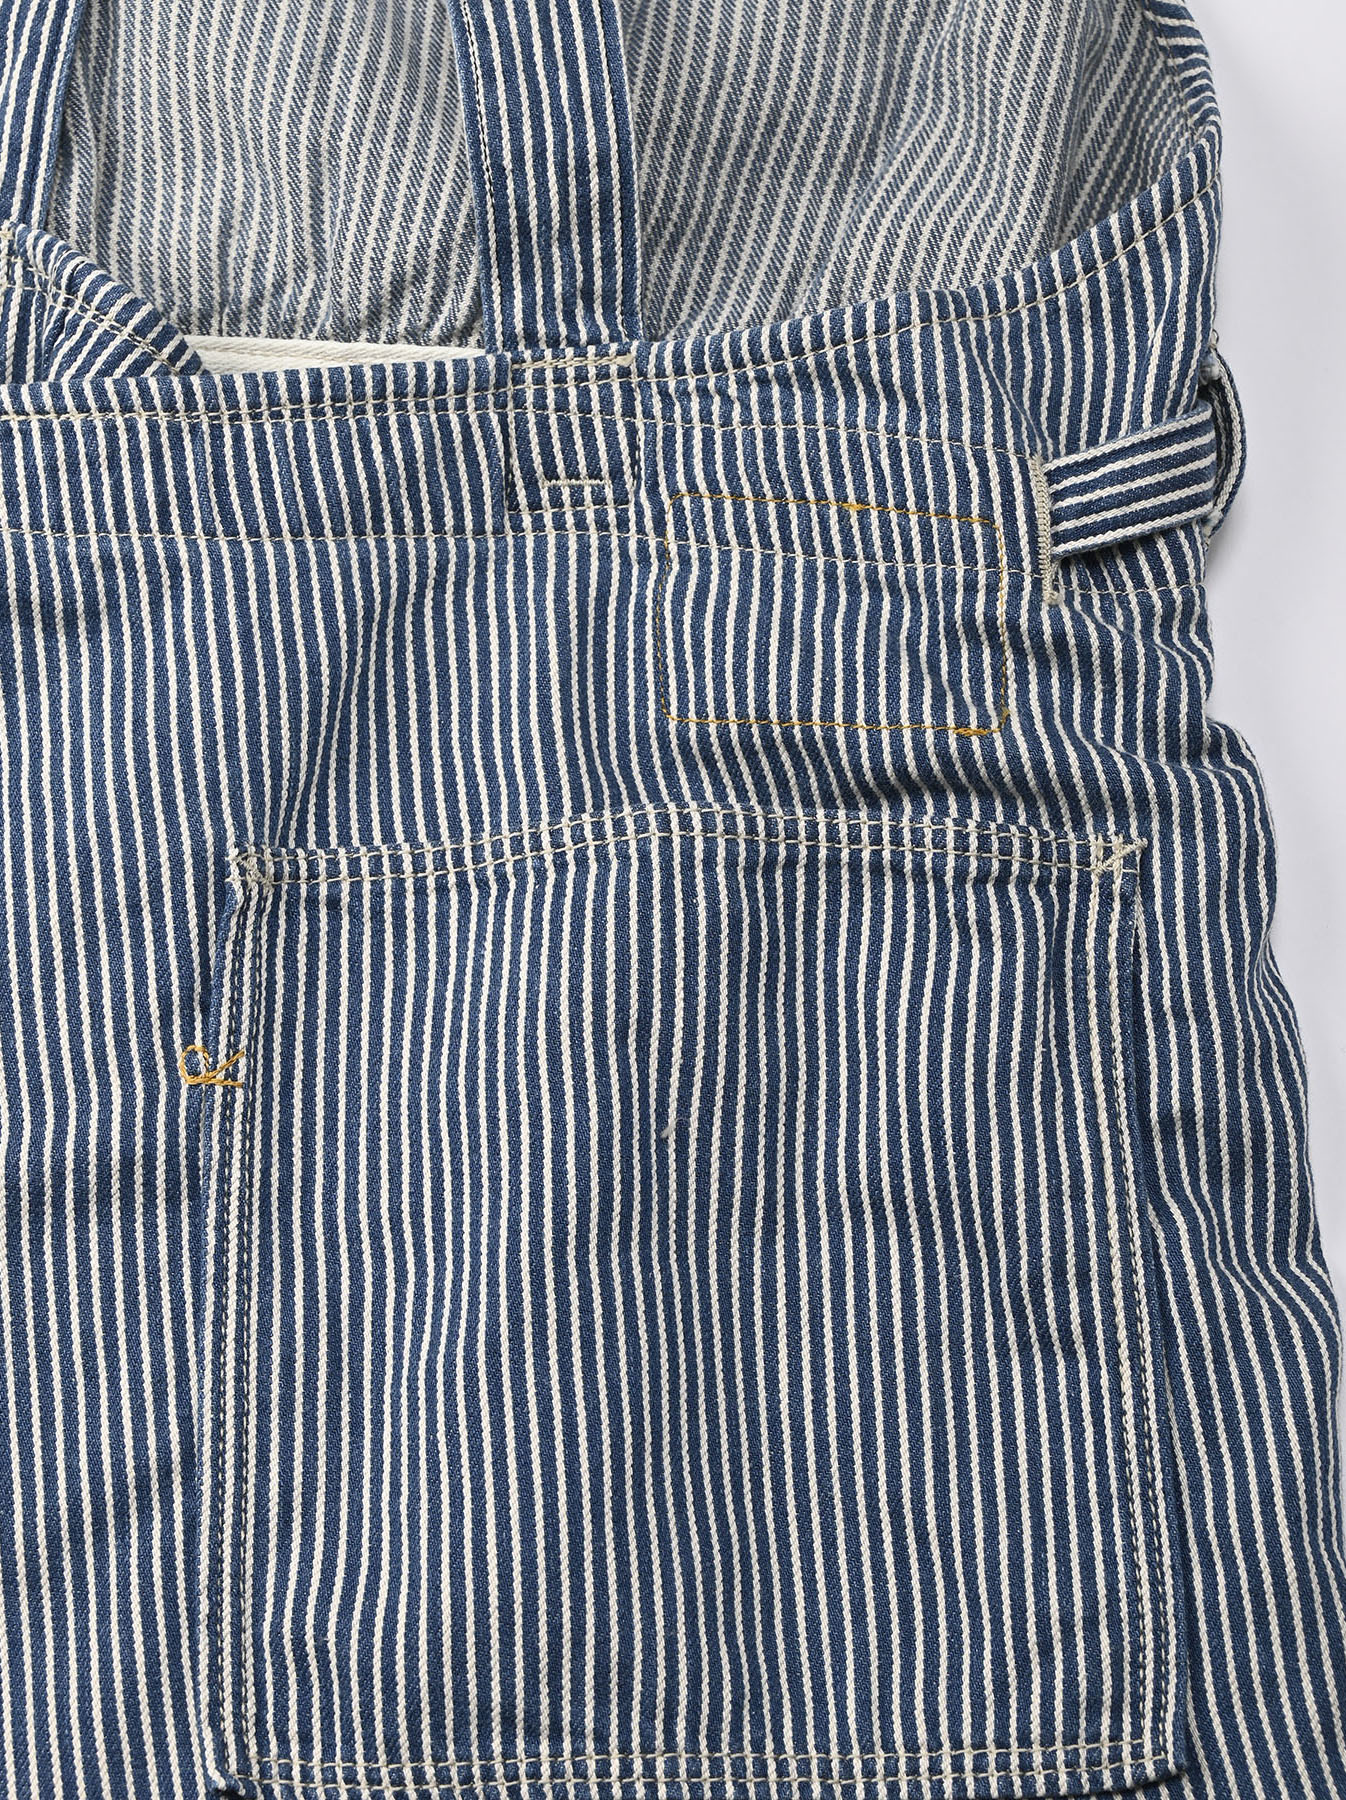 Komugi Denim Aprion Dress-9